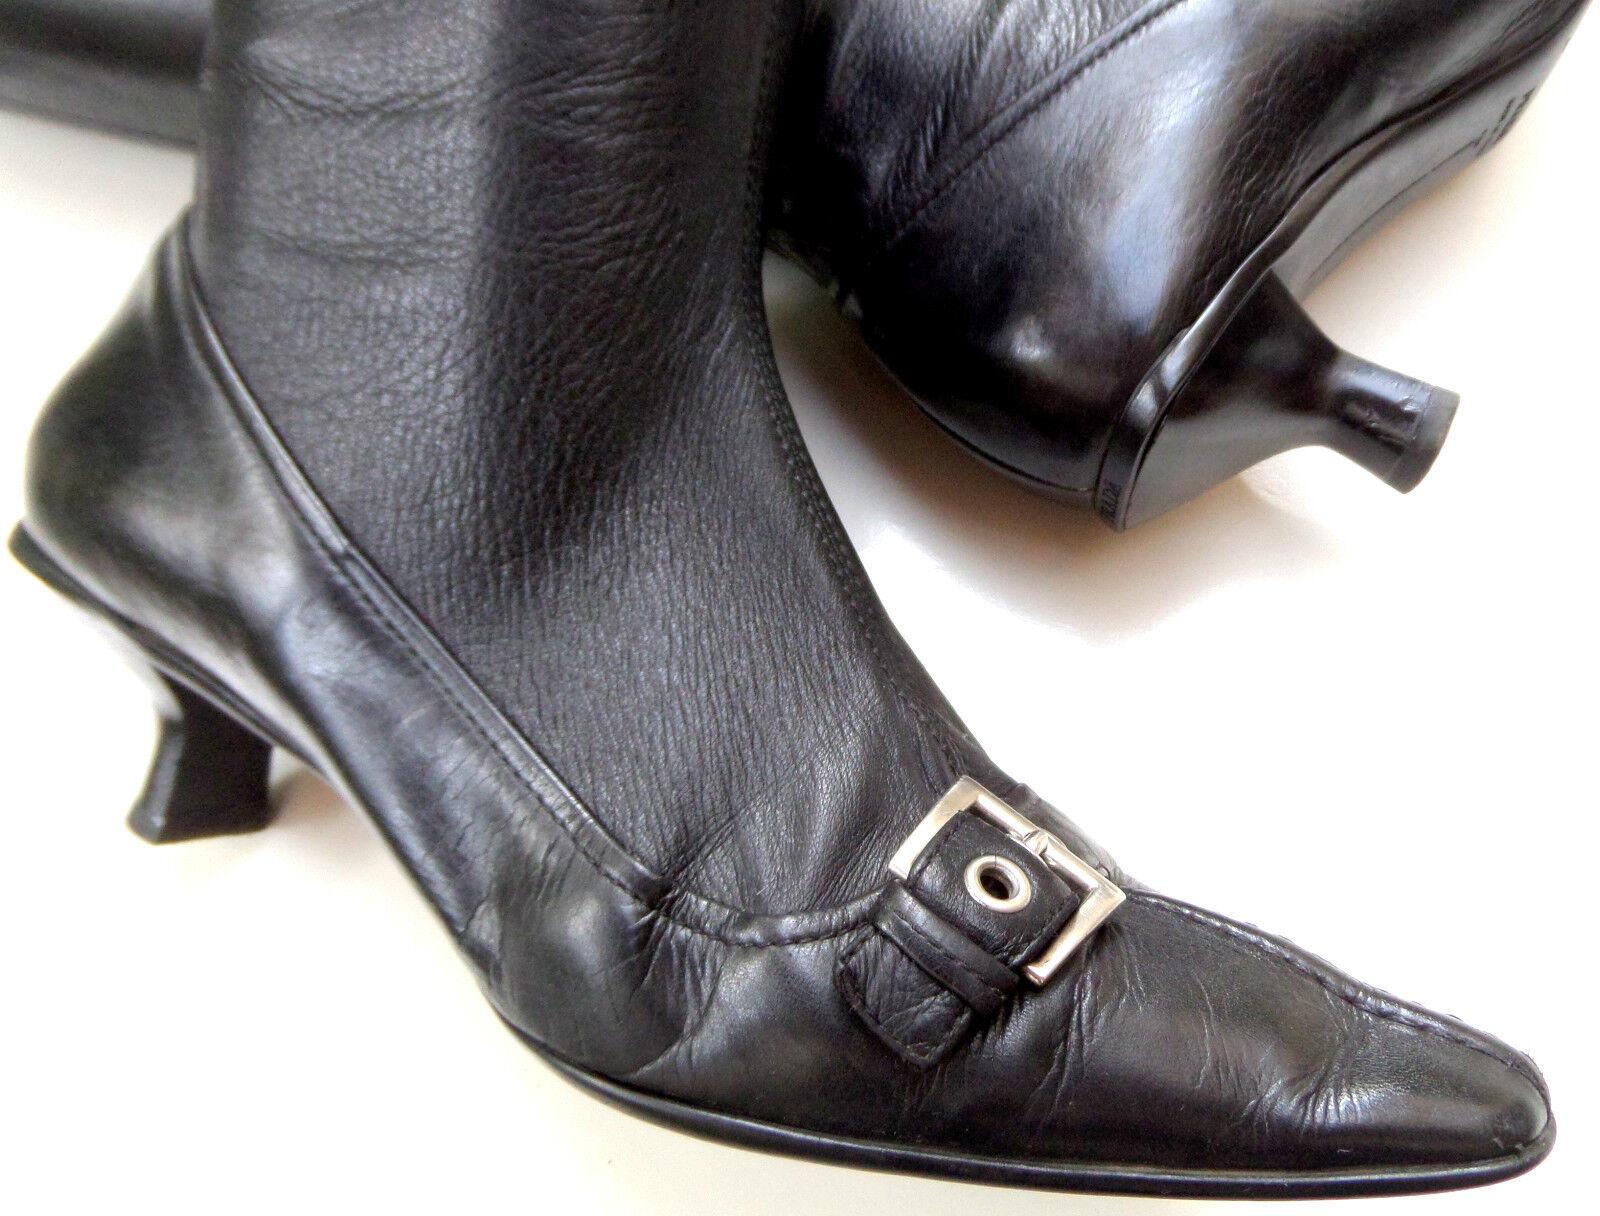 T O P PRADA Damen Leder Stiefel Art i Gr e 38 e Gr v t l 38.5 S C H W A R Z 96b867